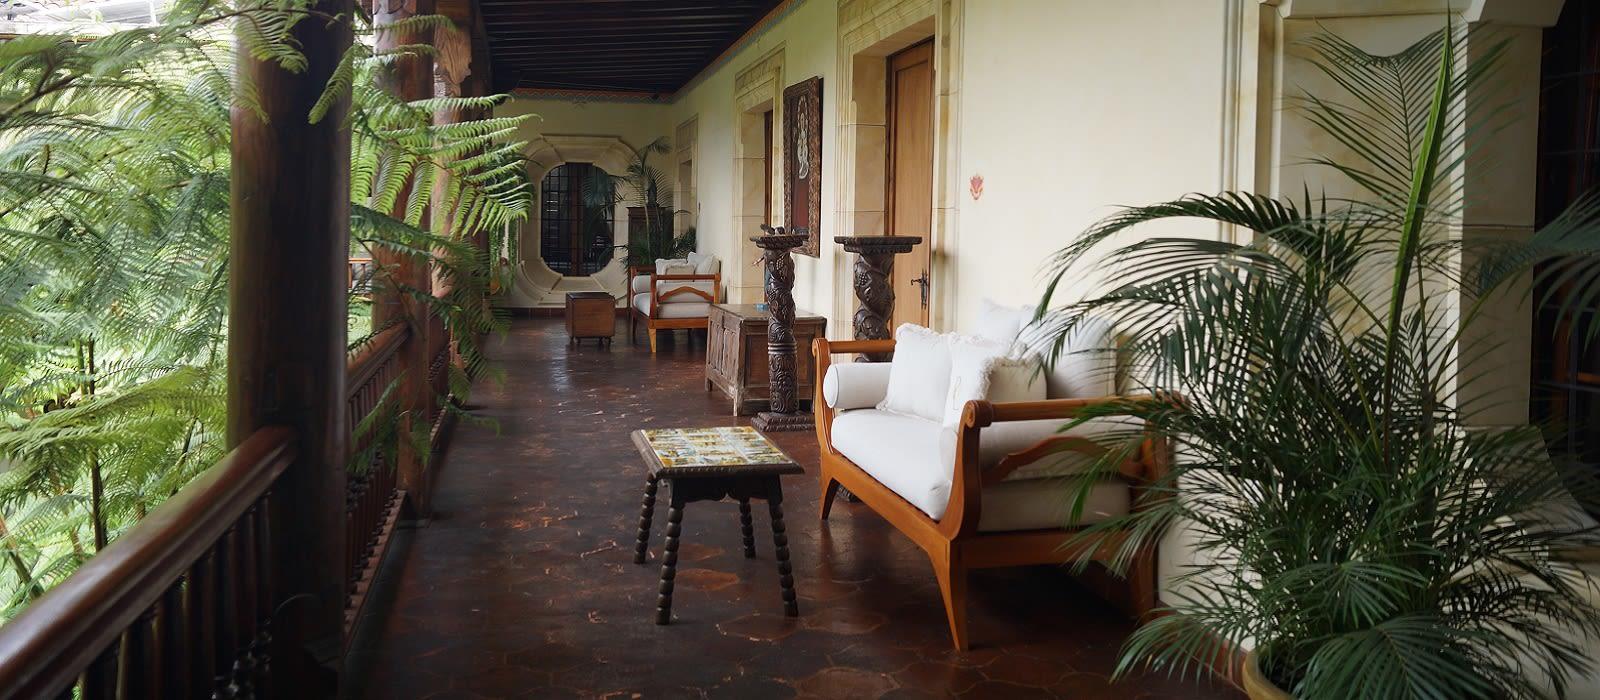 Hotel Palacio de Doña Leonor Guatemala